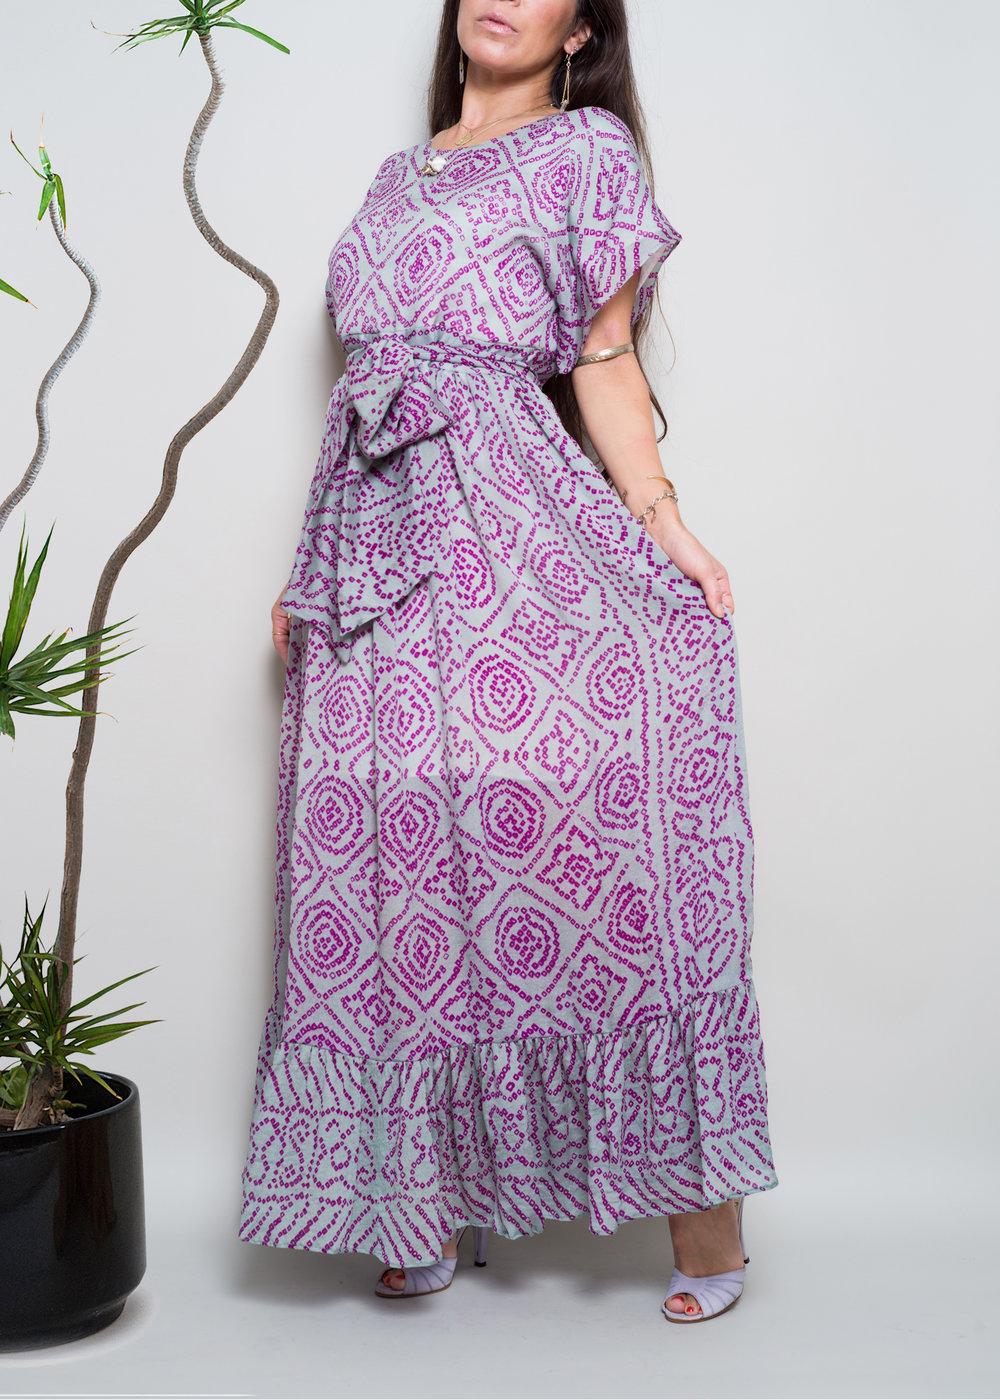 Vintage Indian Silk Sari Chiffon dolman maxi dress